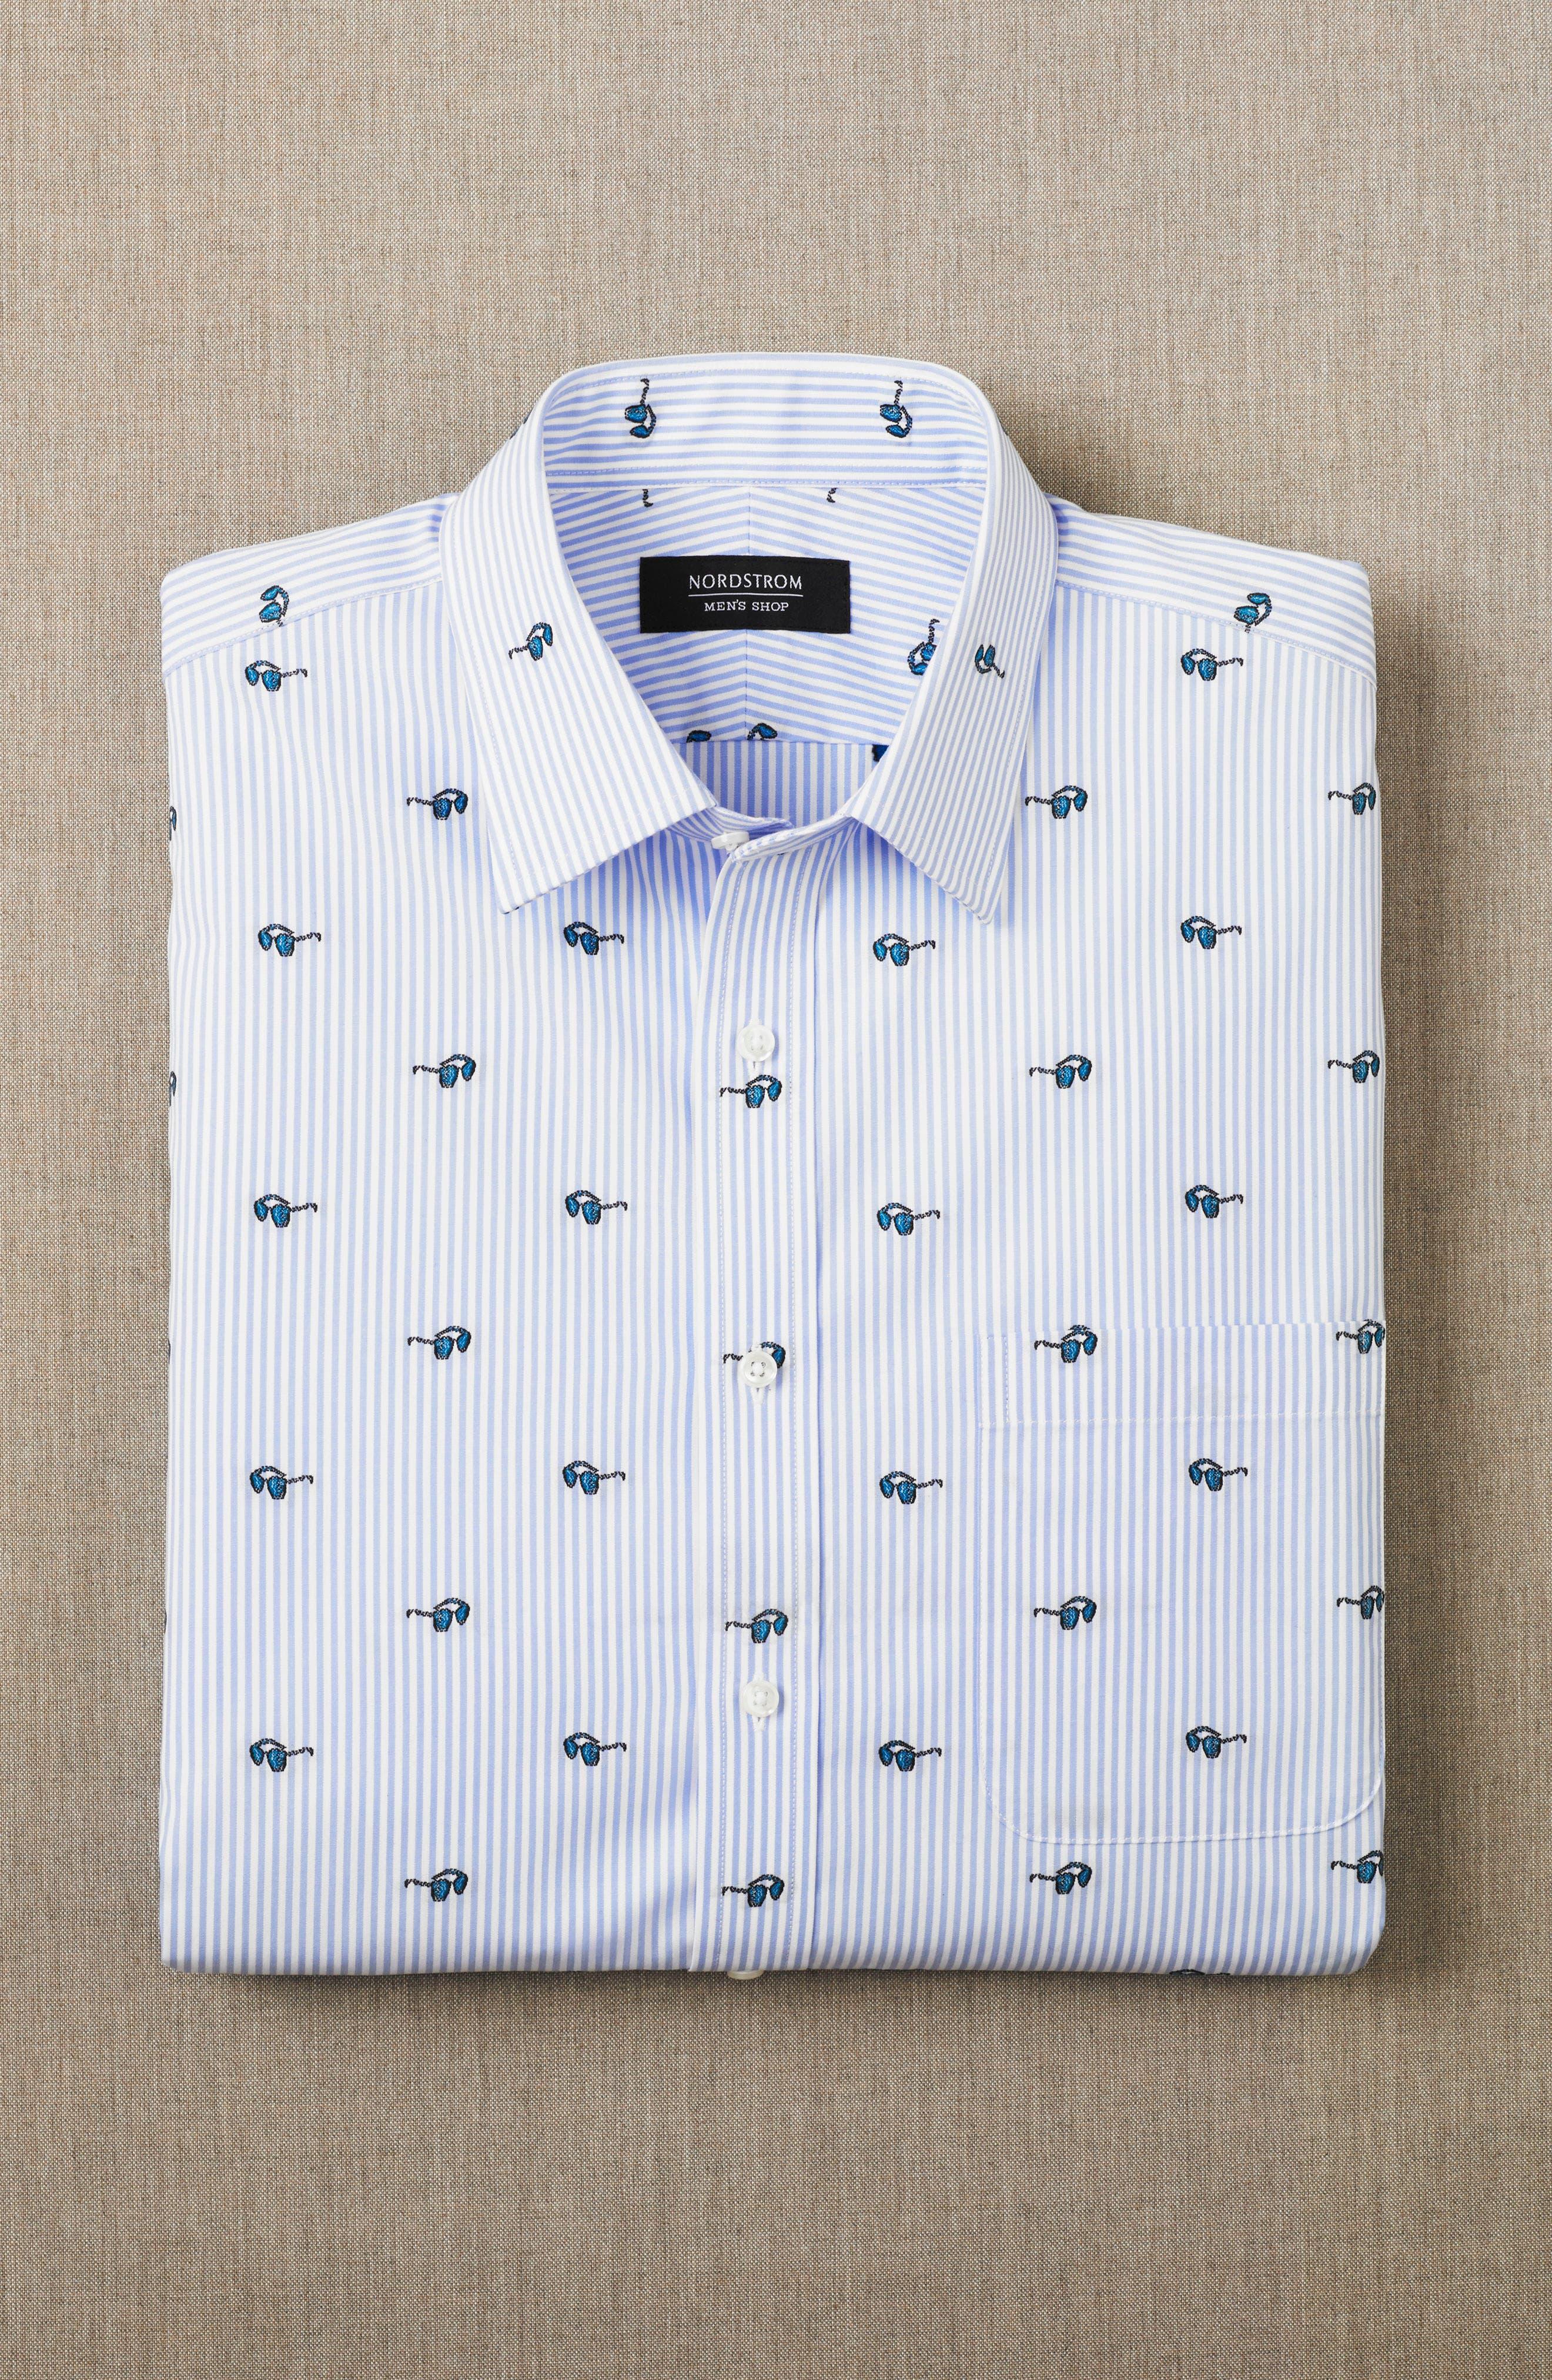 Alternate Image 3  - Nordstrom Men's Shop Trim Fit Sunglasses Print Dress Shirt